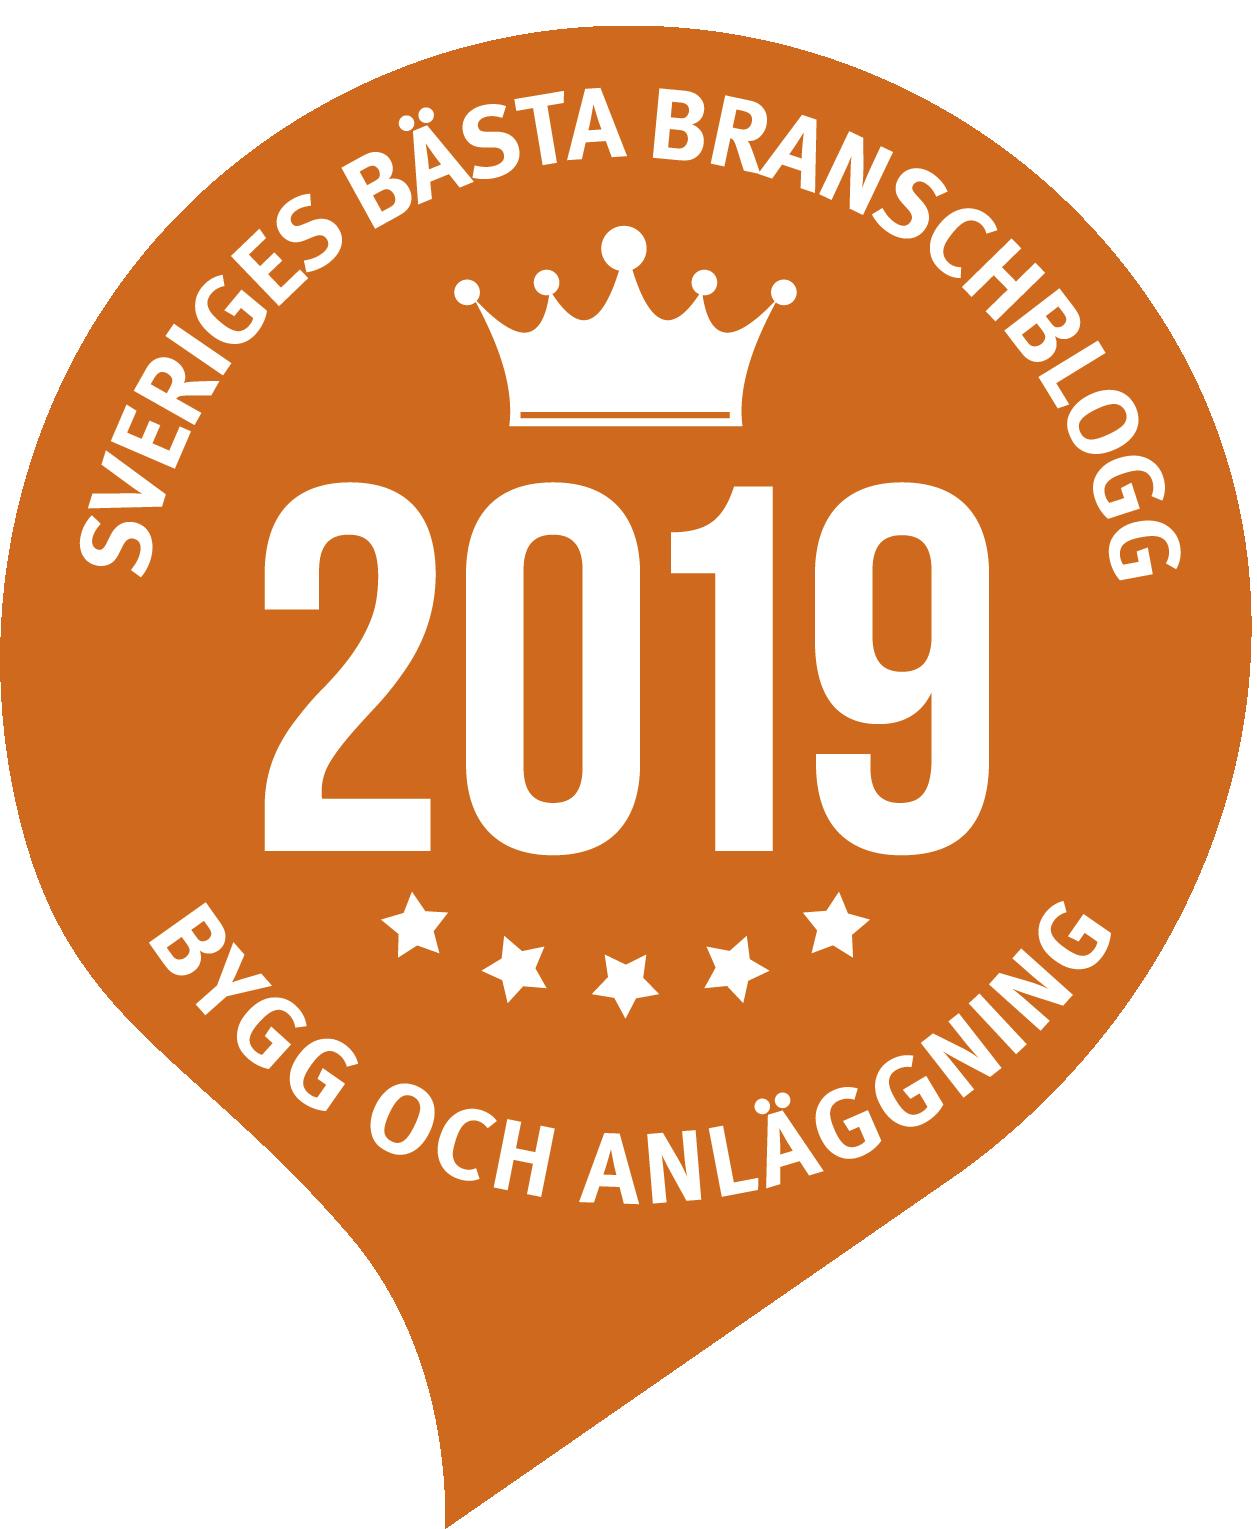 Sveriges bästa branschblogg 2019